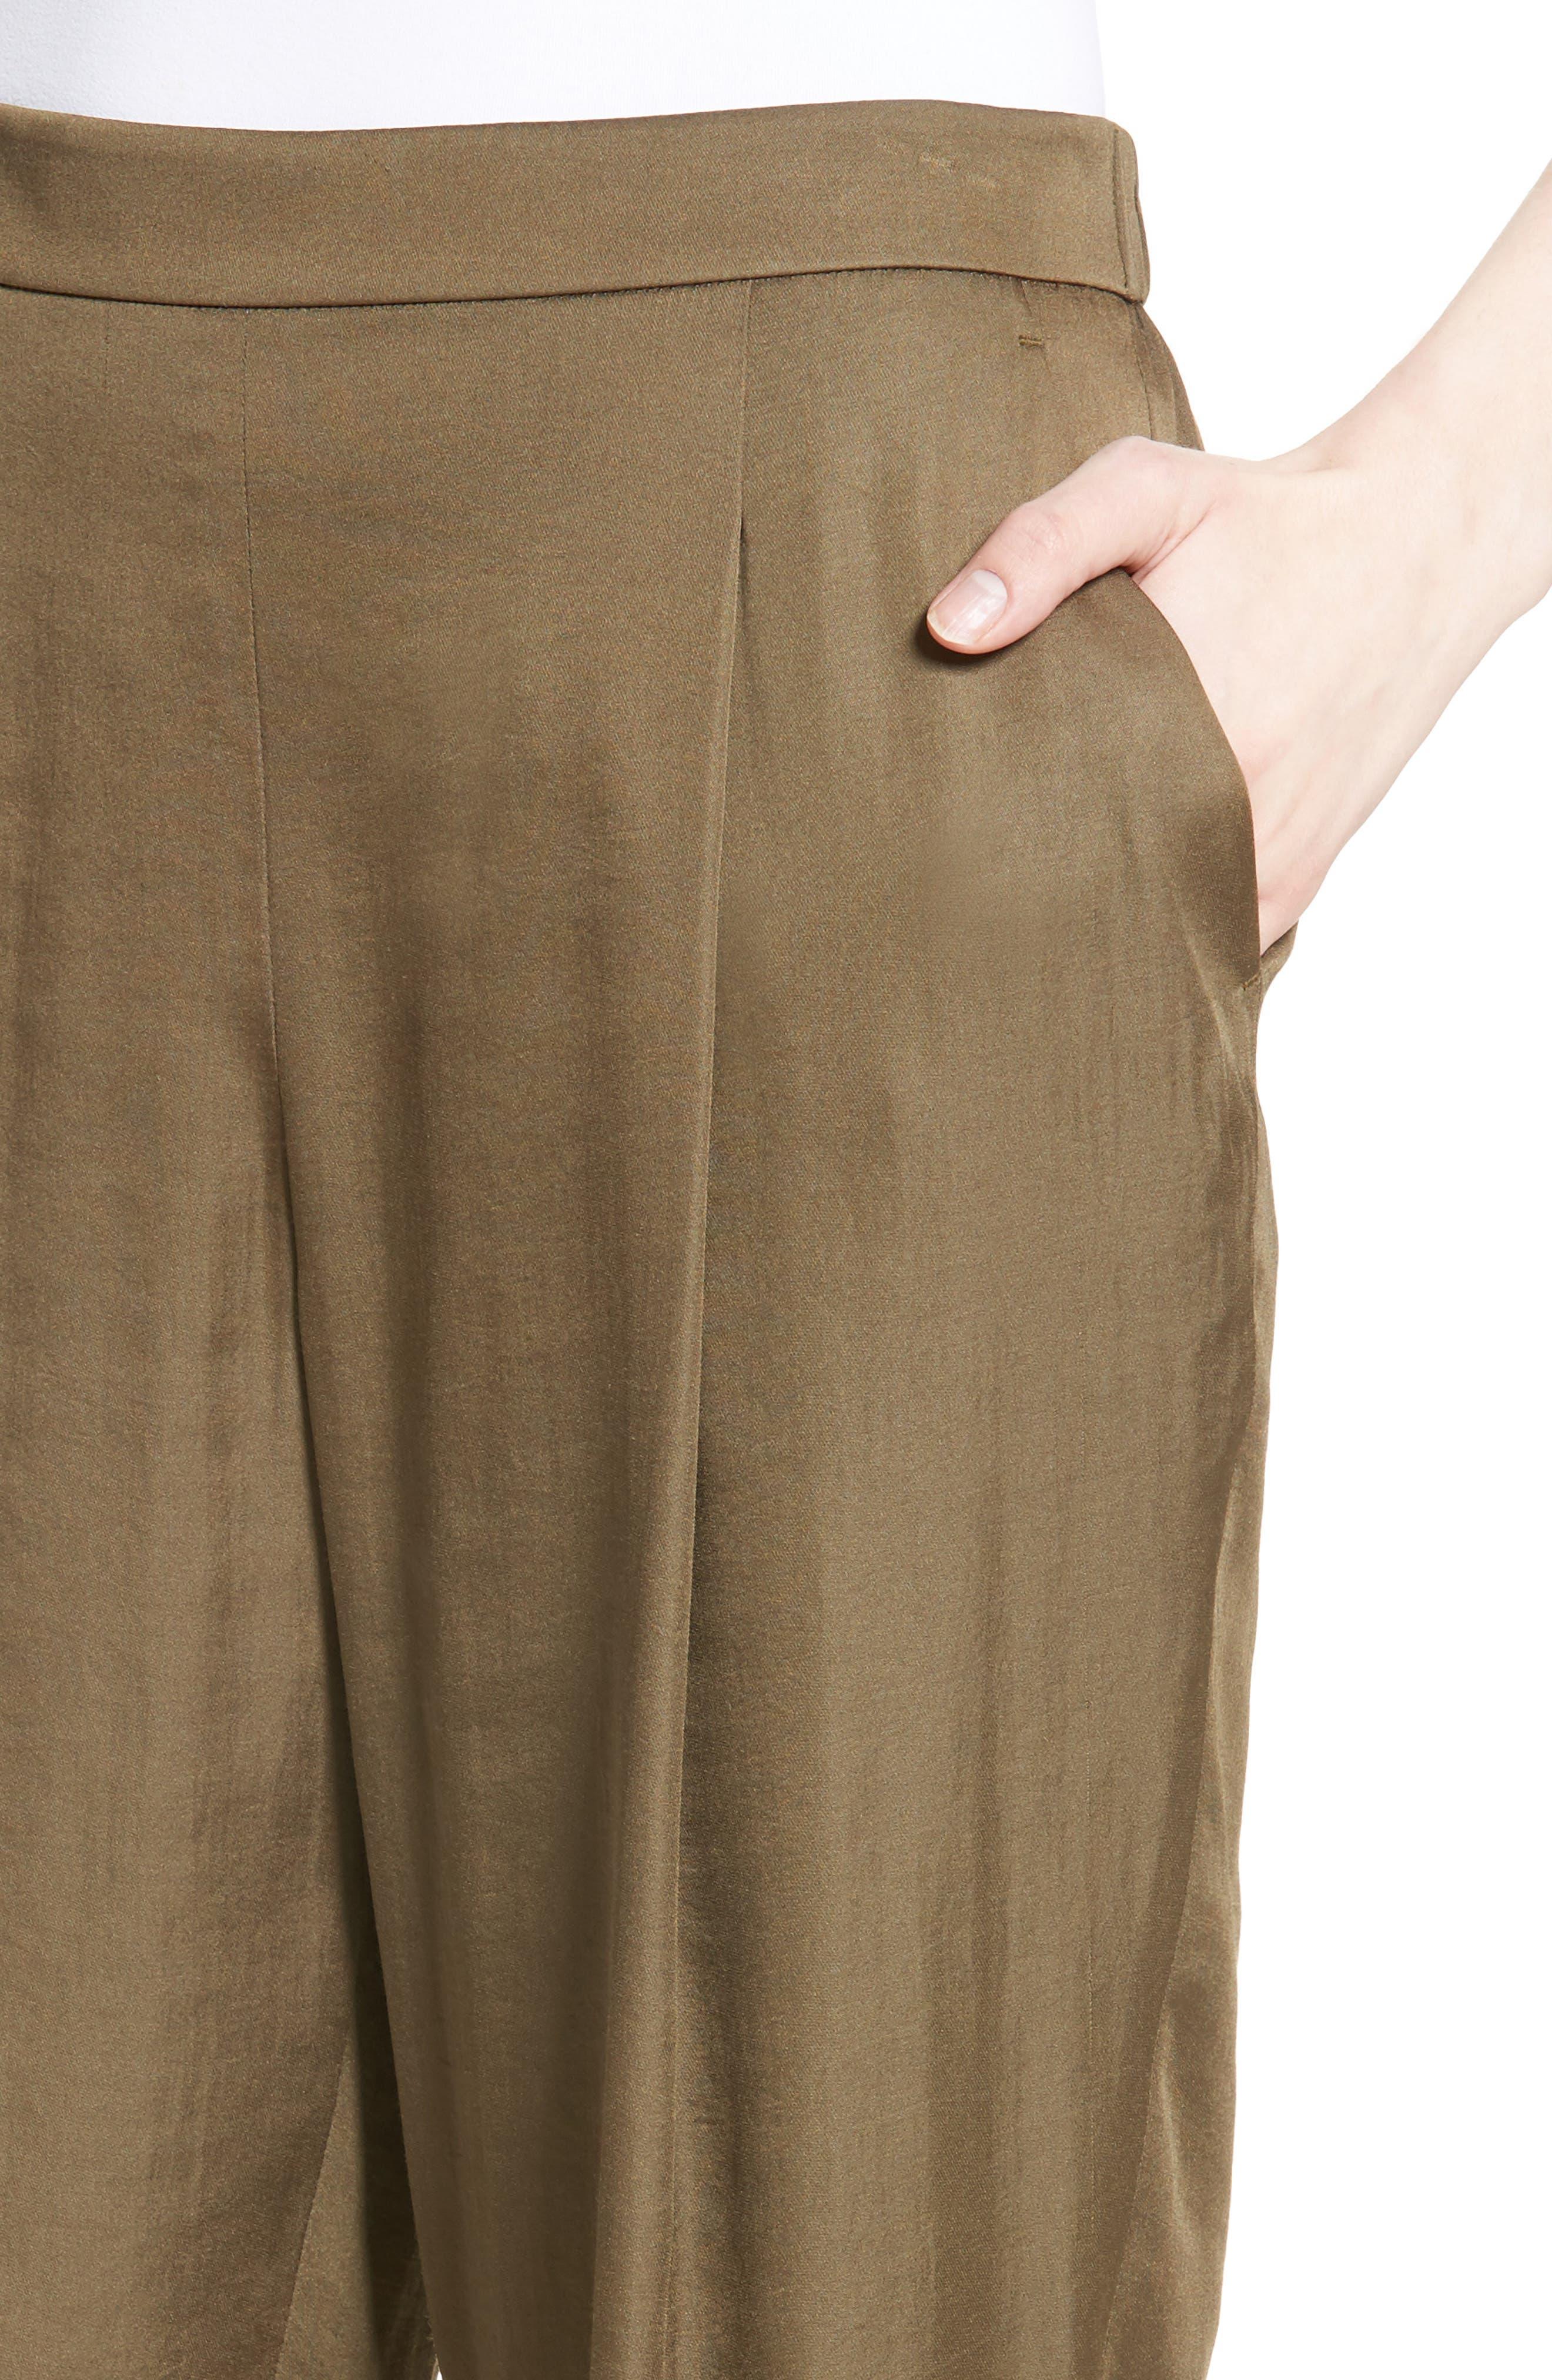 Soho Track Pants,                             Alternate thumbnail 4, color,                             399